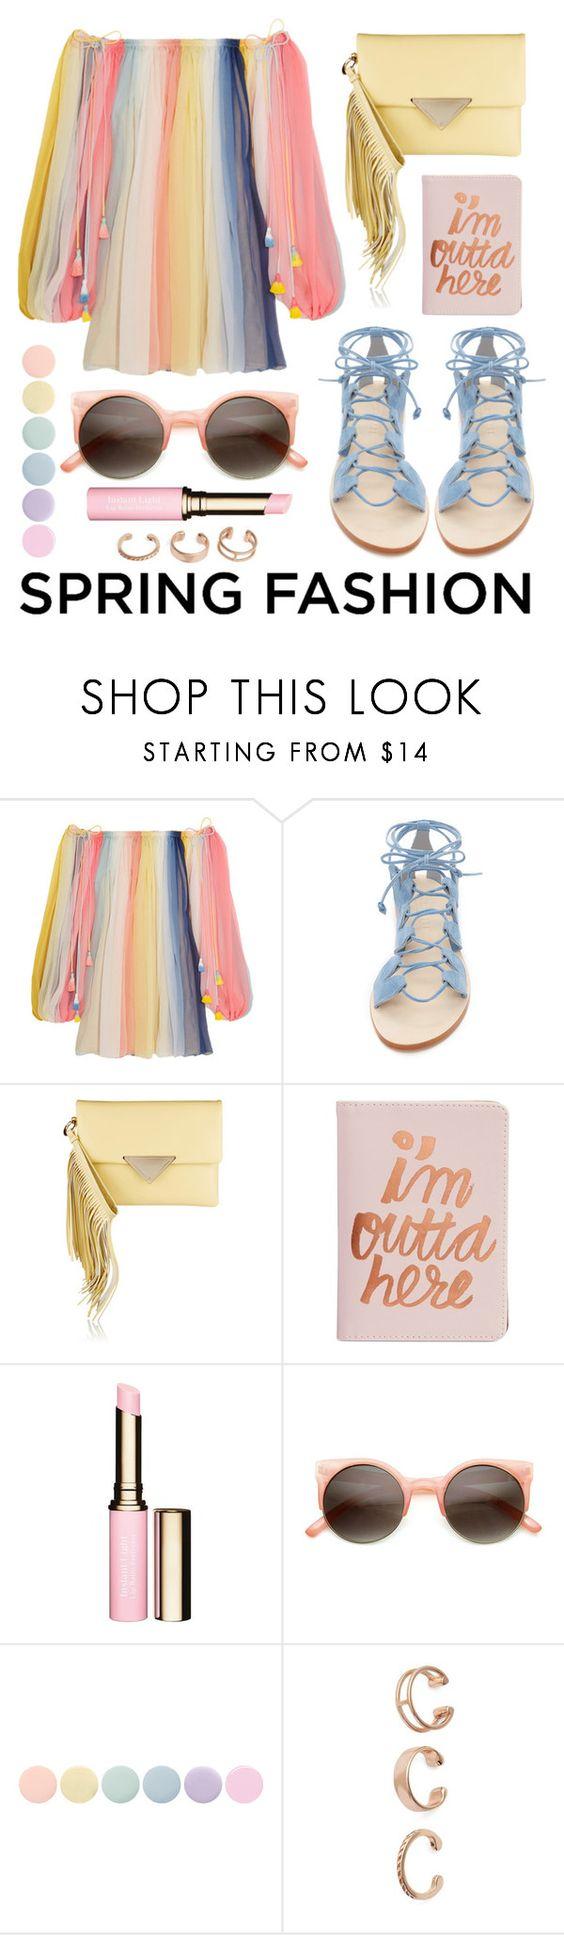 """Spring Dress Fashion"" by stacey-lynne ❤ liked on Polyvore featuring Chloé, Cornetti, Sara Battaglia, ban.do, Clarins, Deborah Lippmann and Kendra Scott"